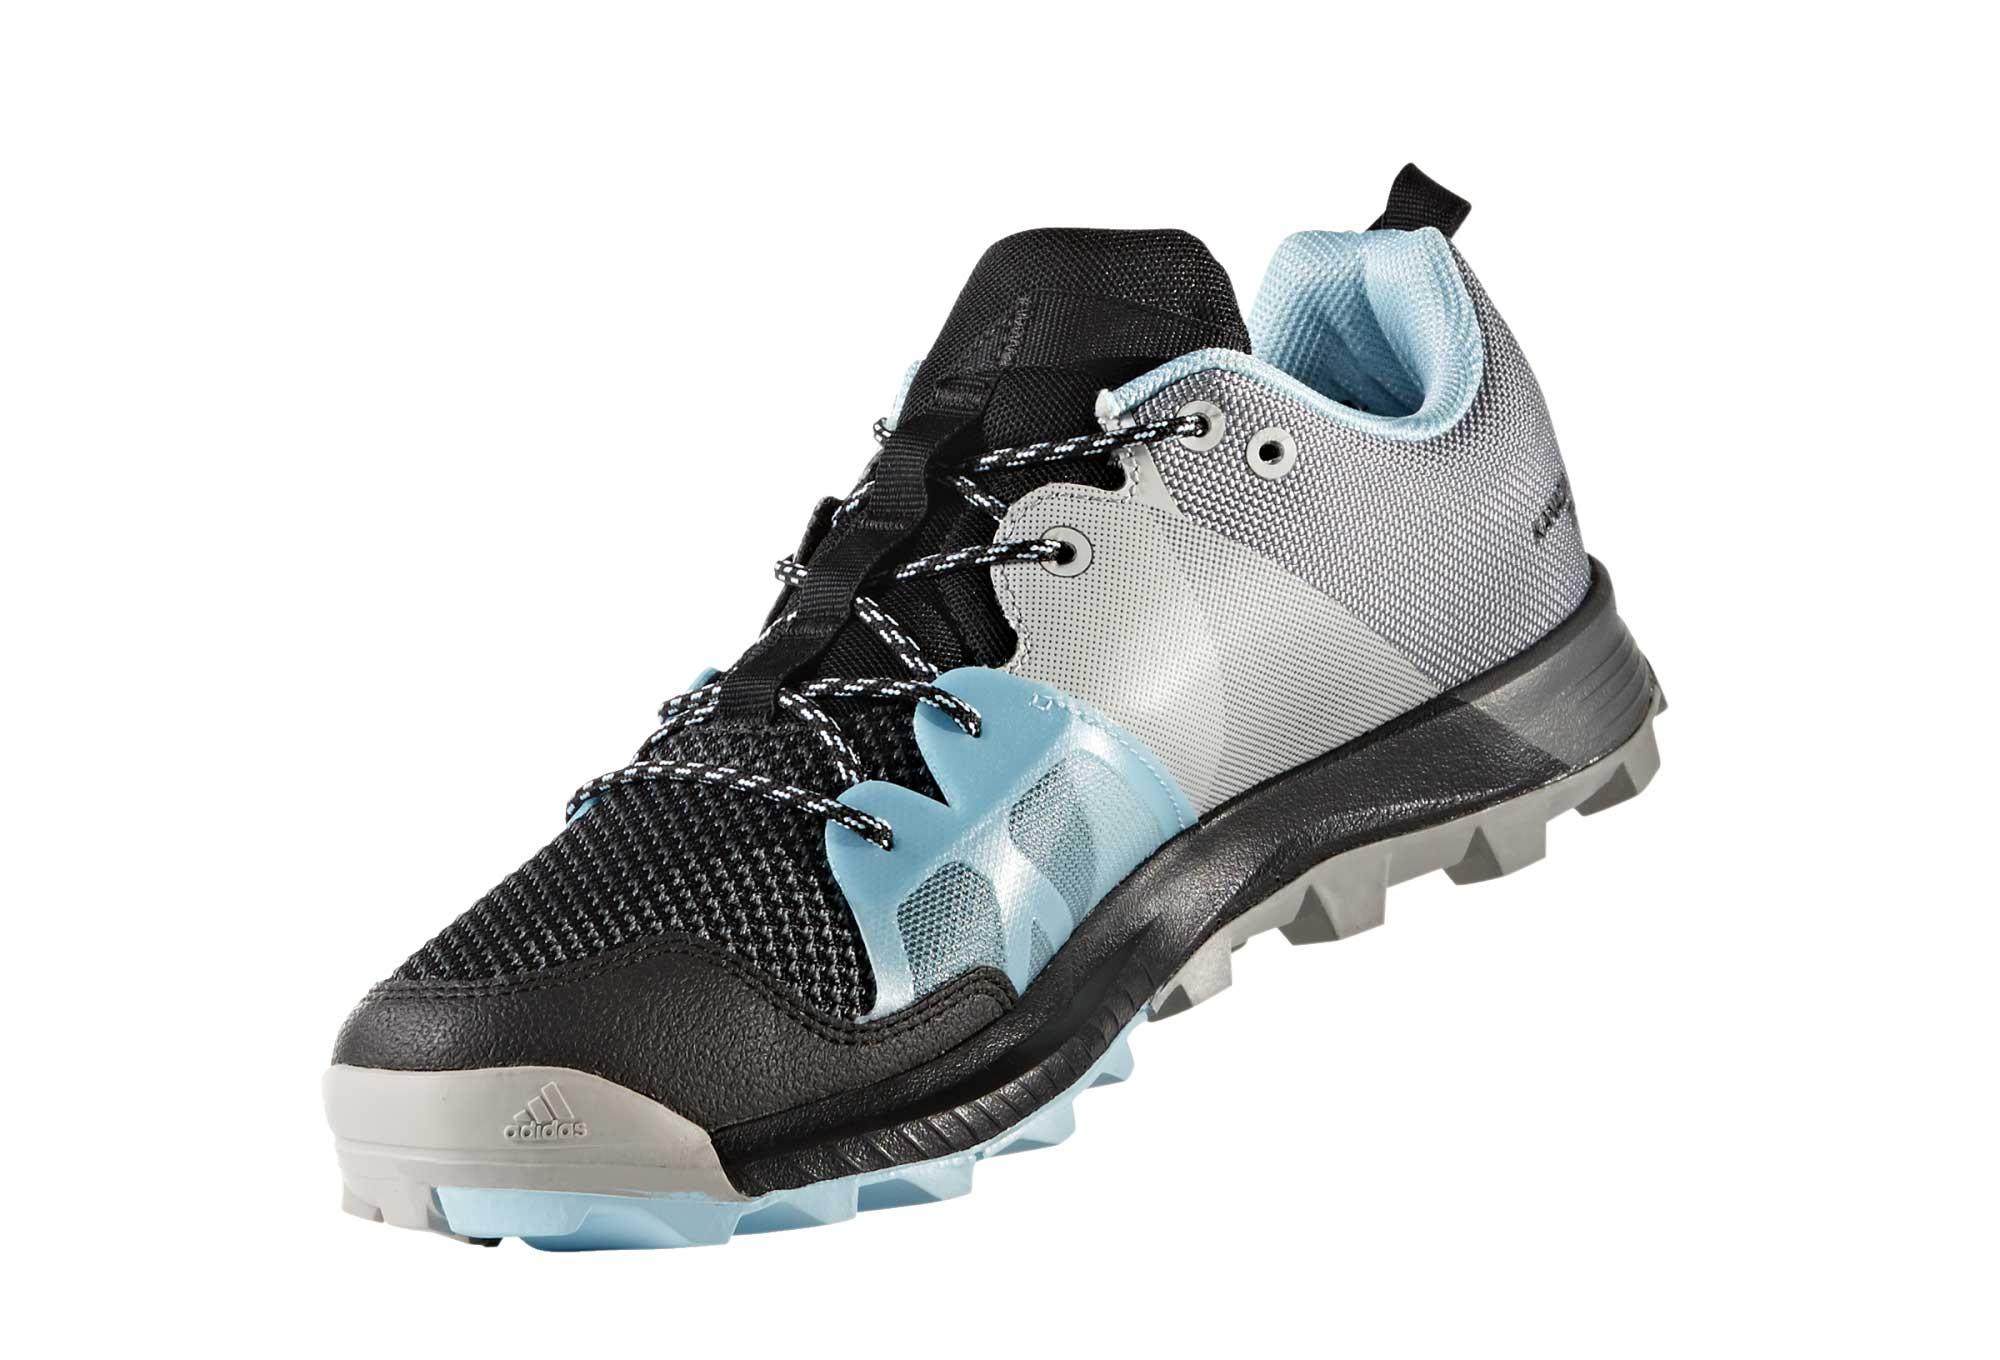 622edcc0b65 Chaussures de Trail Femme adidas running Kanadia 8.1 Trail Gris   Noir